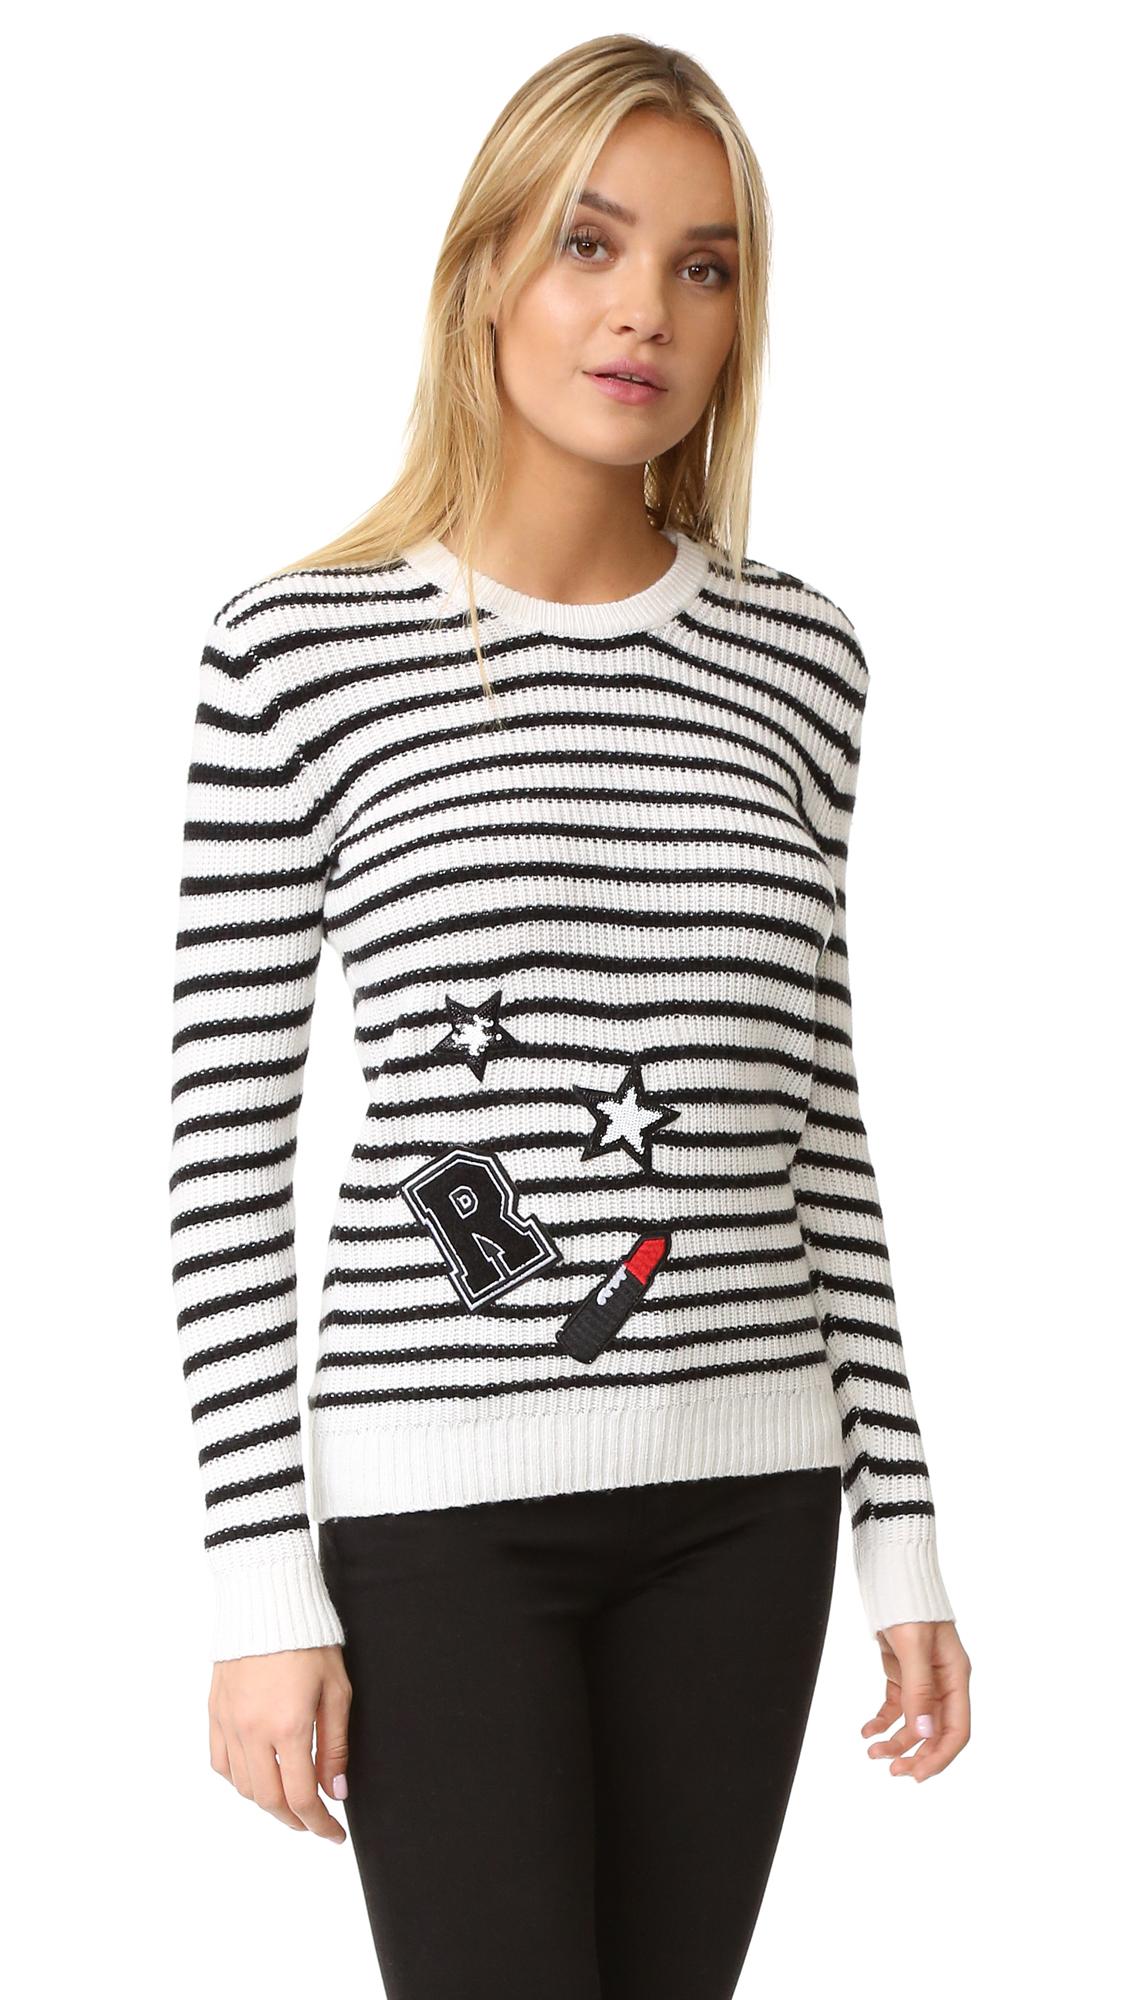 Rebecca Minkoff Prim Stripe Sweater With Patches - Chalk/Black Stripe